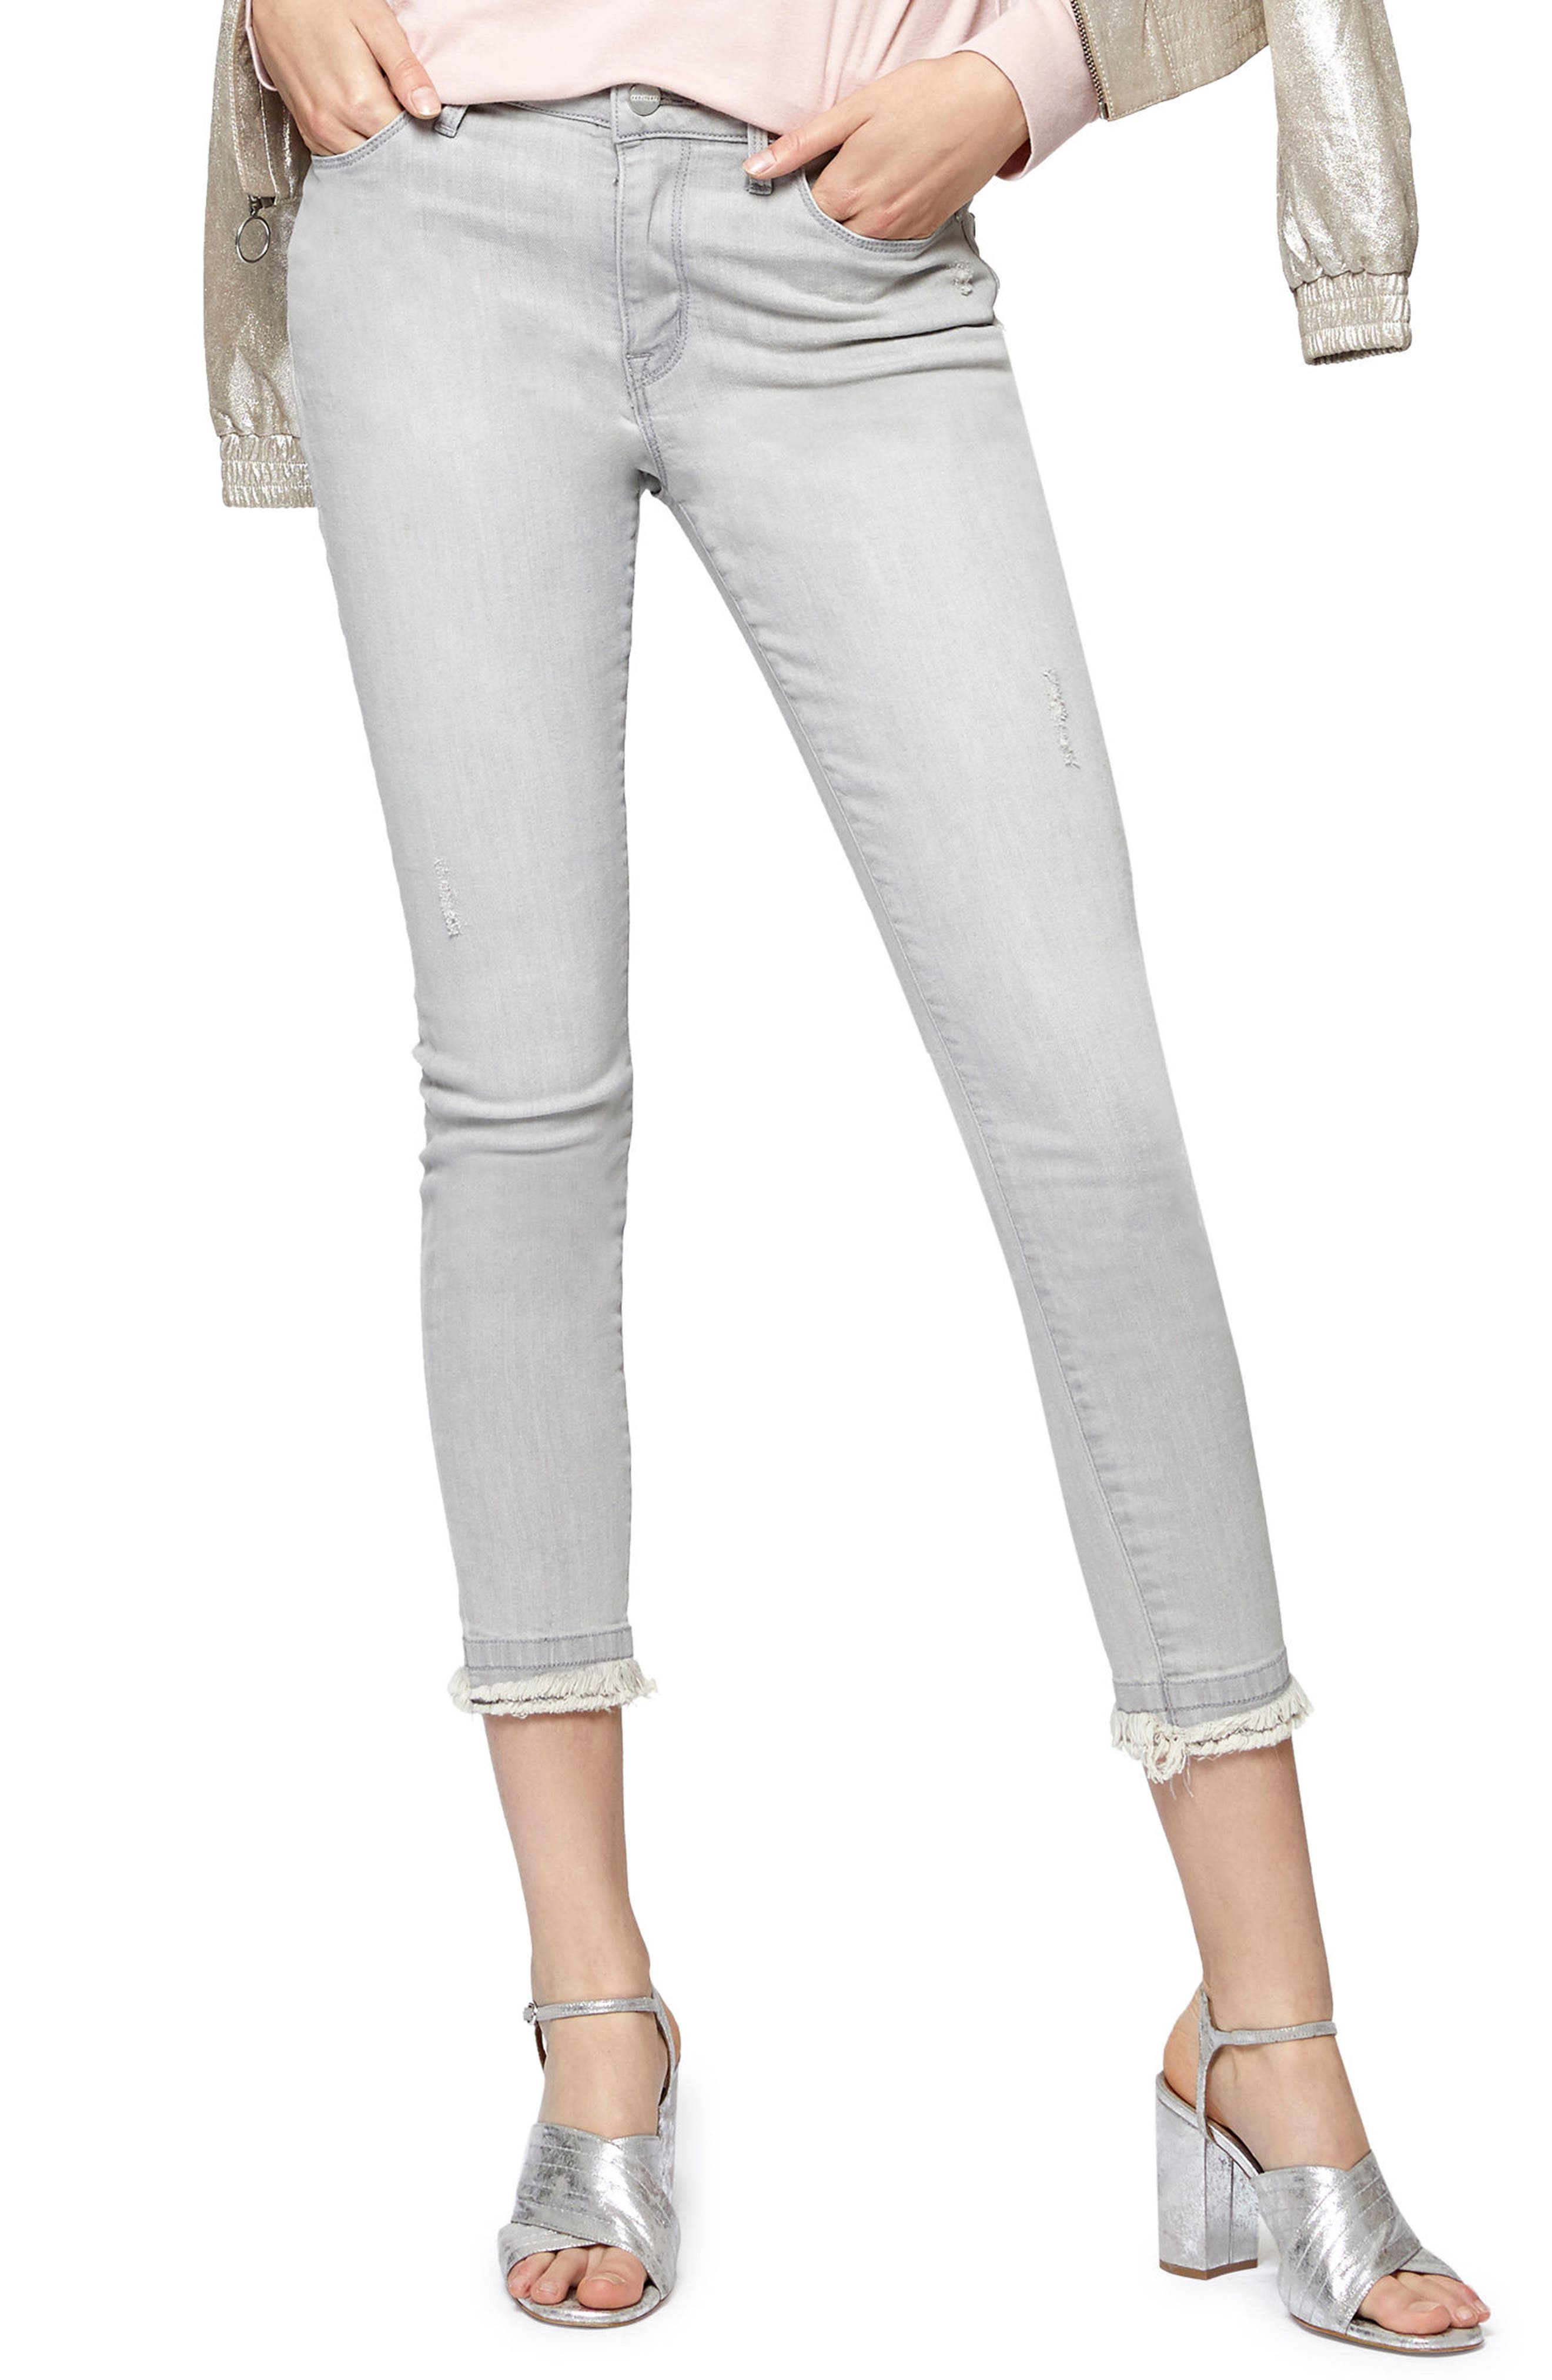 Saige Double Fray Ankle Jeans,                             Alternate thumbnail 3, color,                             Greyson